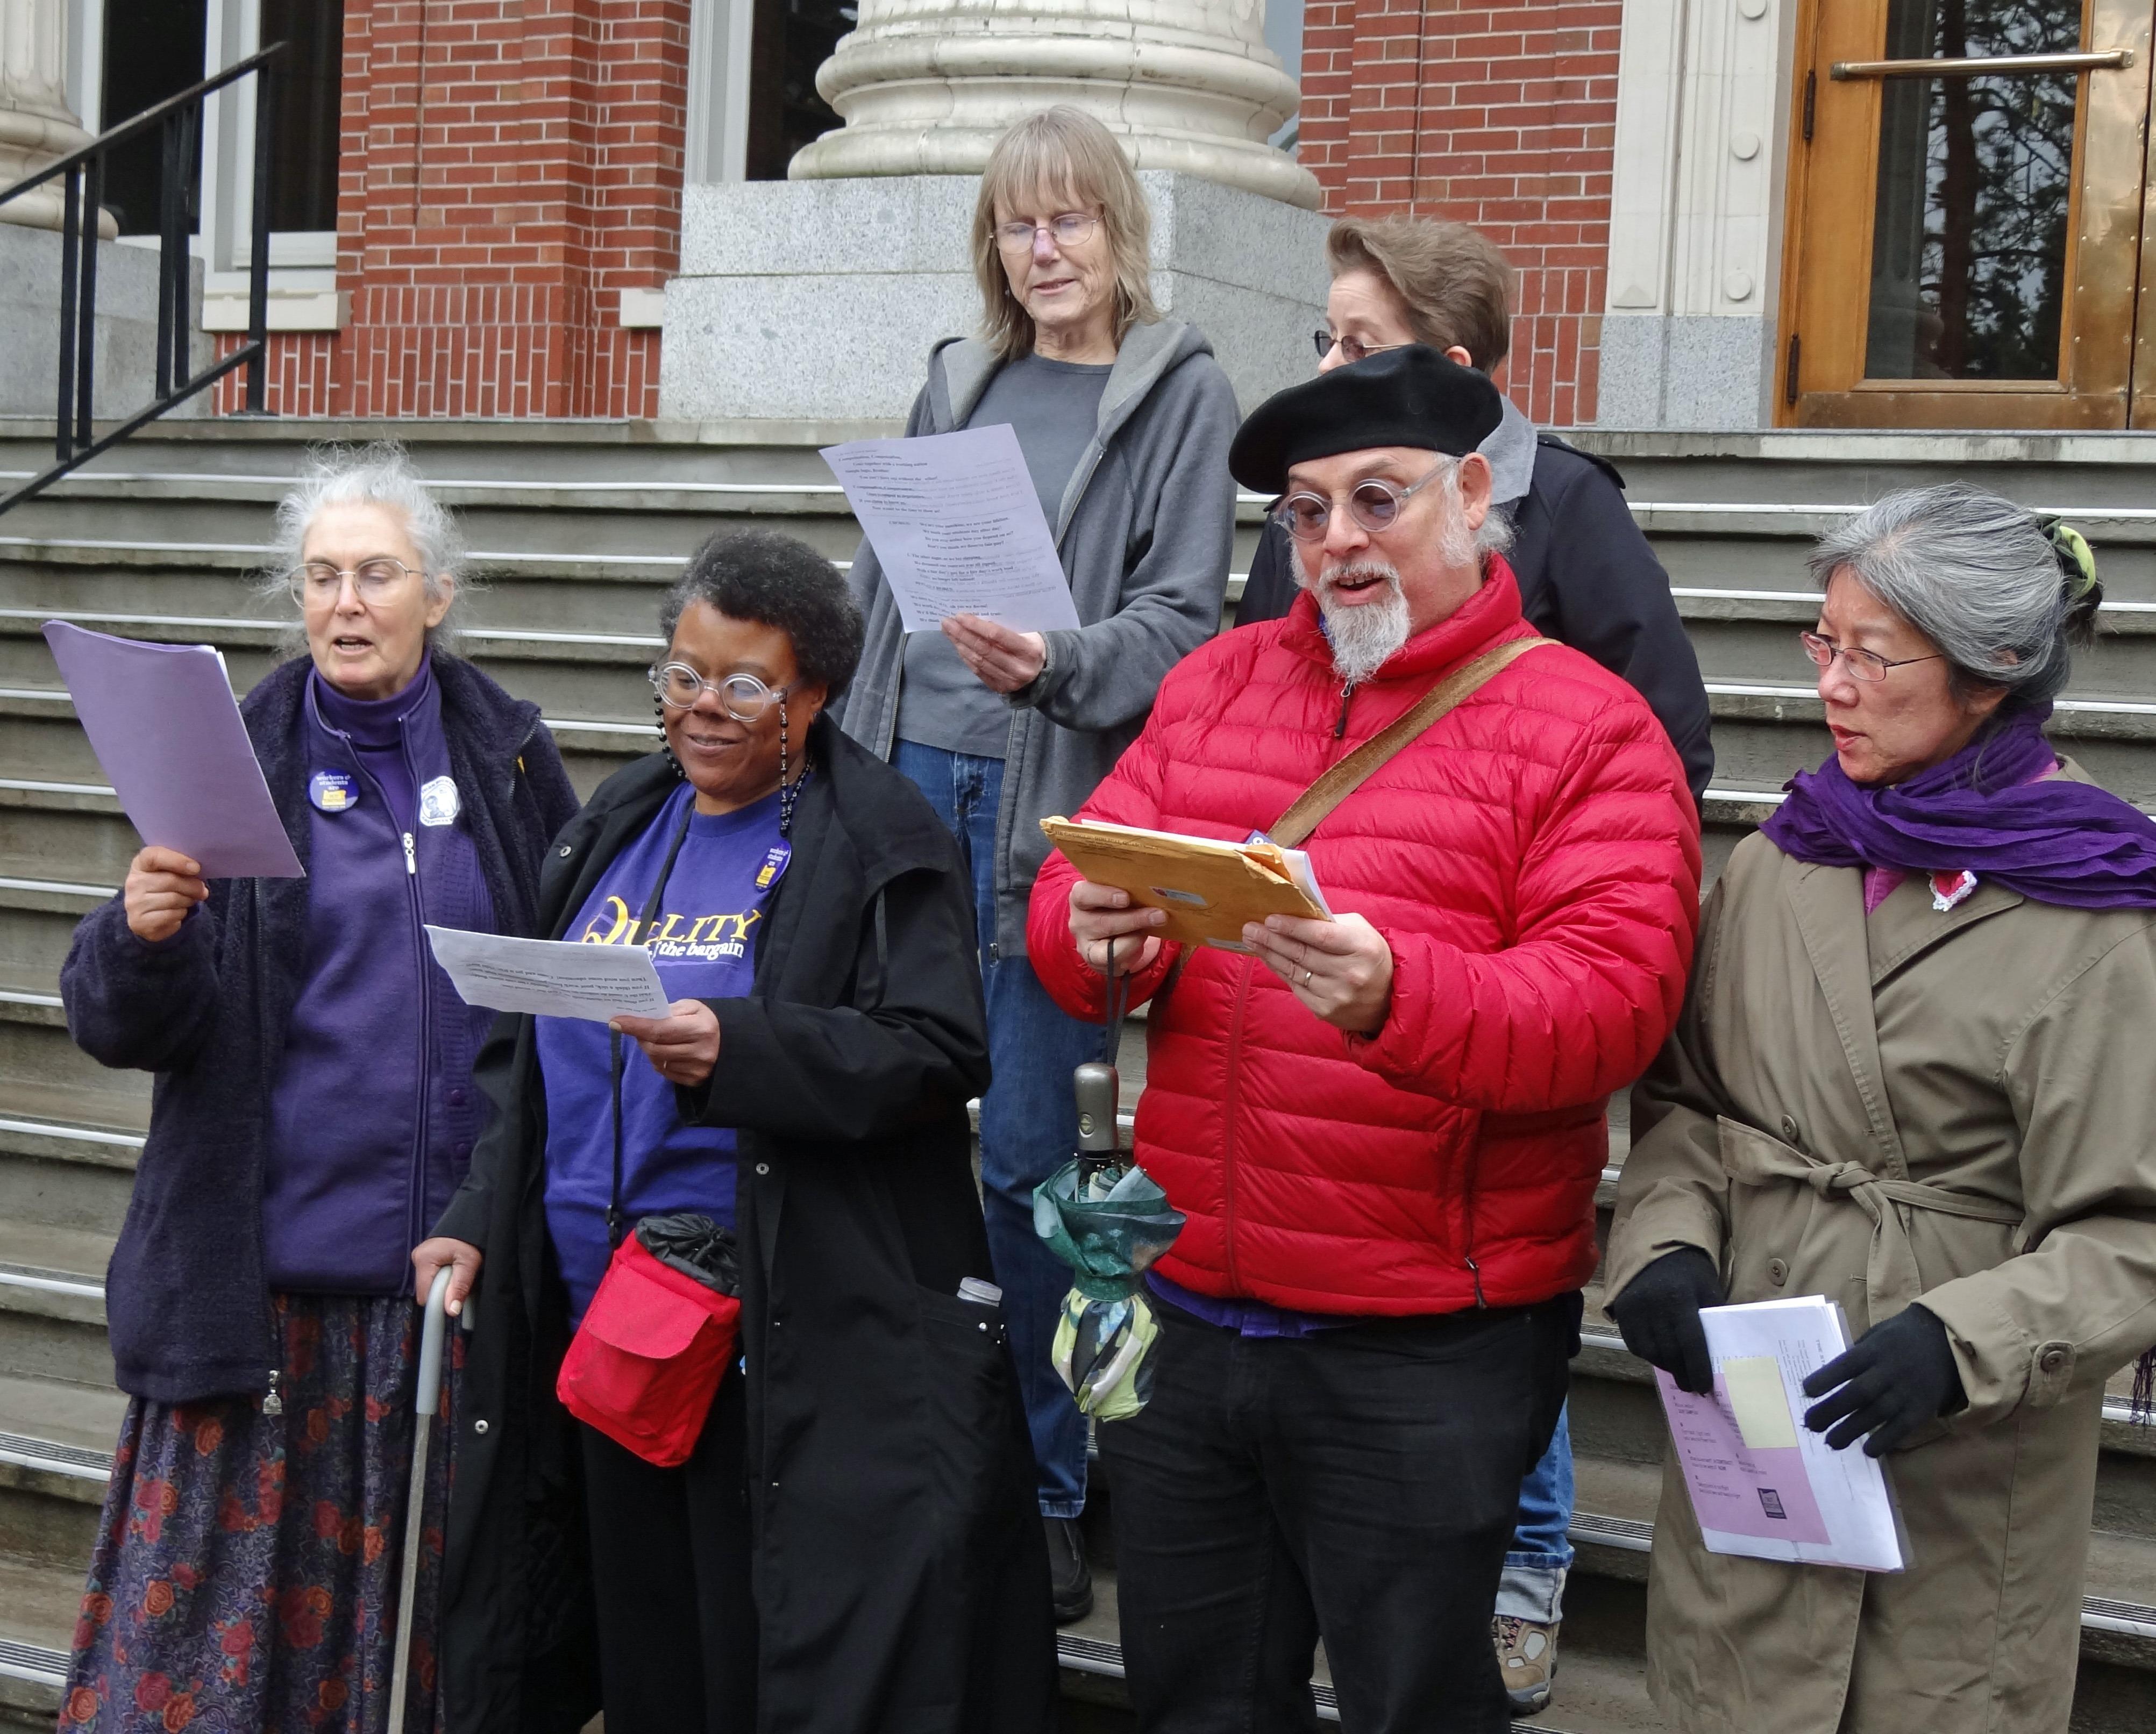 Labor Choir at GTFF Rally: Dorothy Attneave, TK Landazuri, Linda Sappington, David Landazuri, Jani Scallion, and Janny Lau